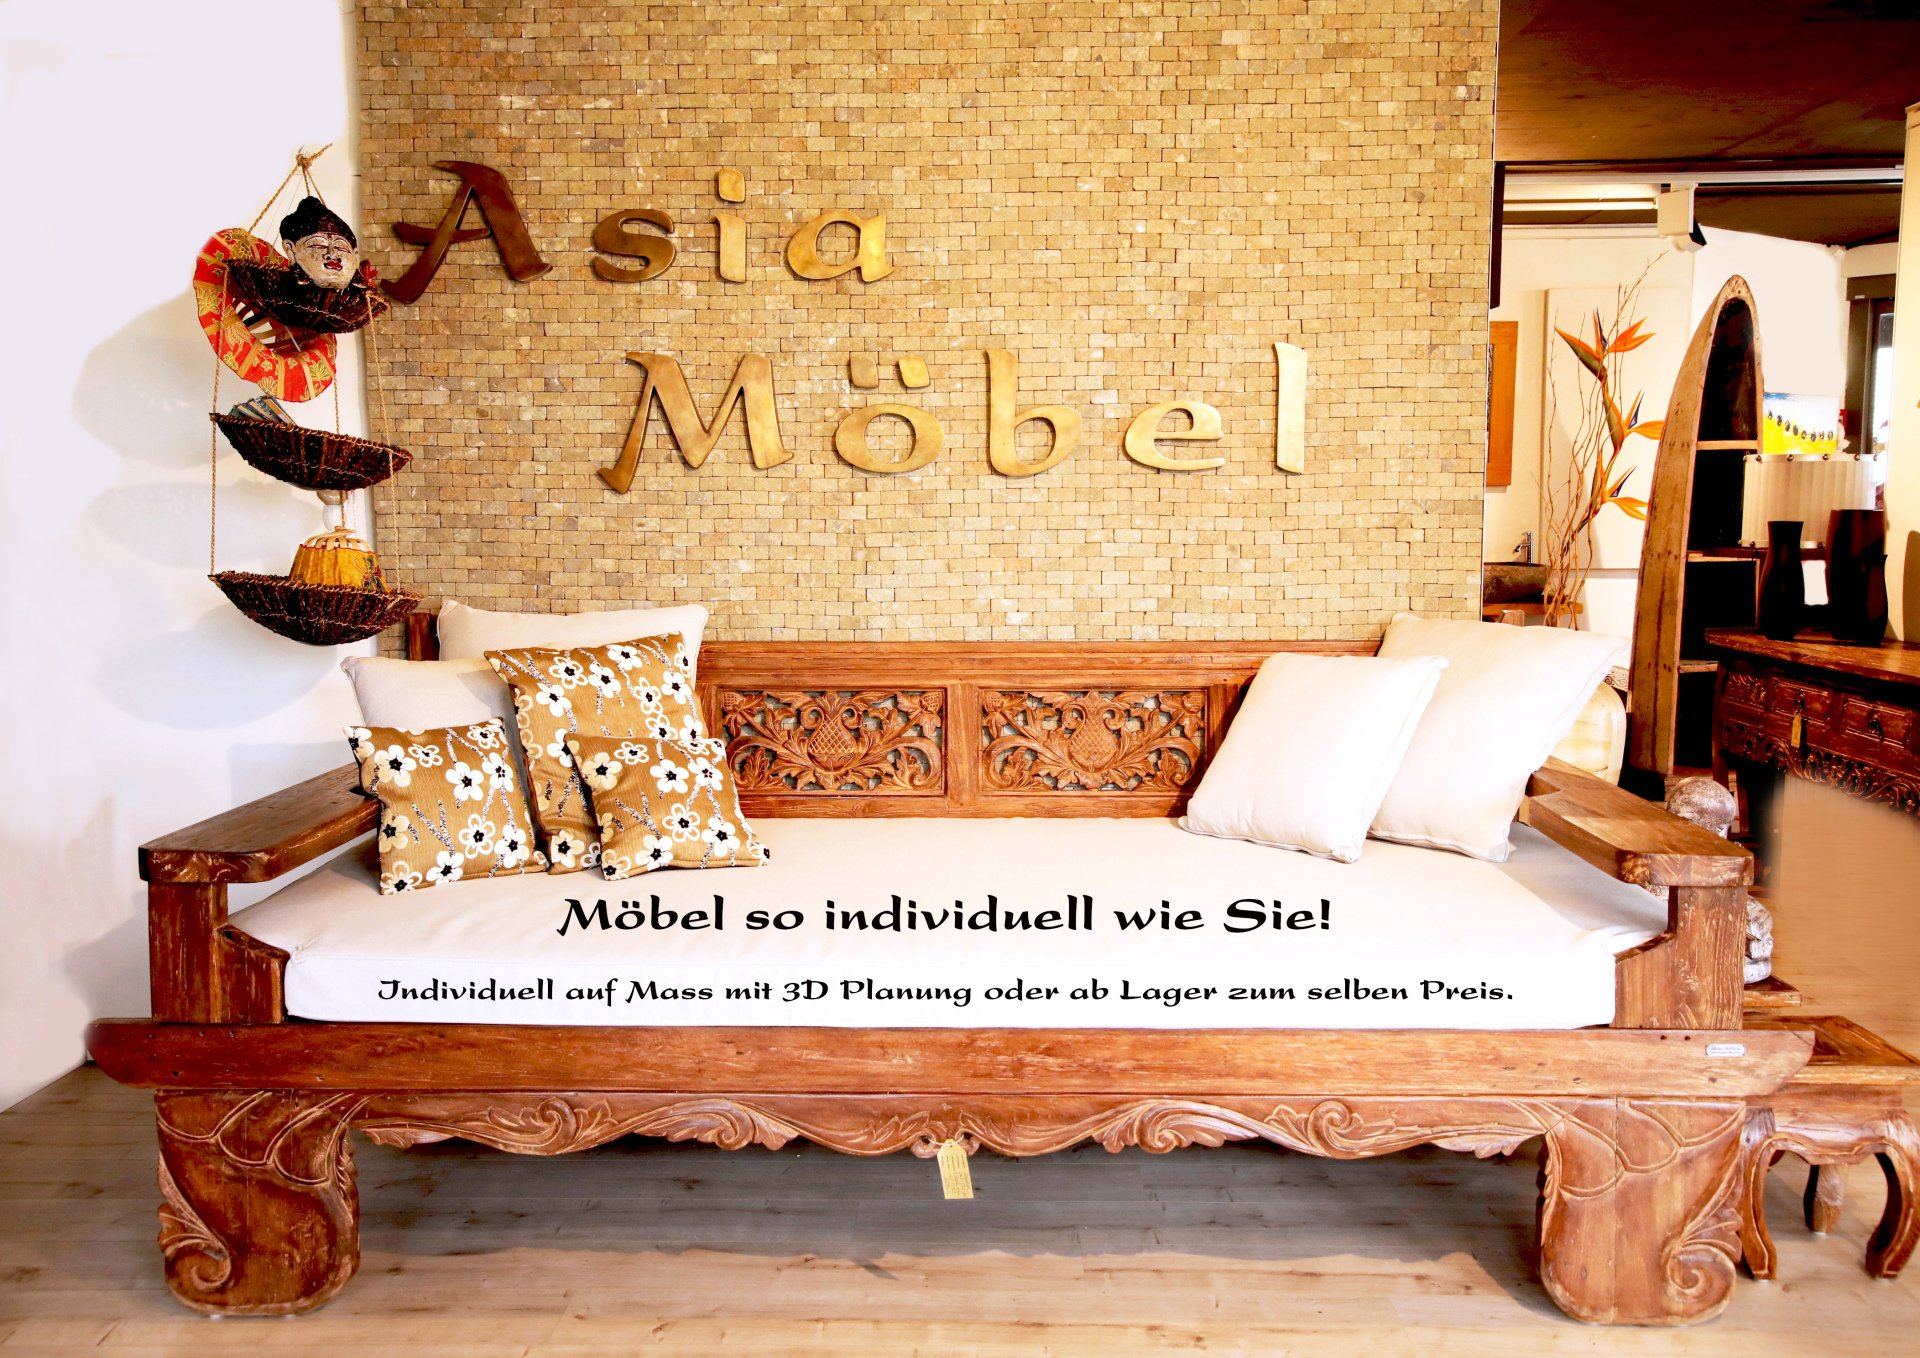 Asia Möbel Bali Möbel Möbel So Individuell Wie Sie